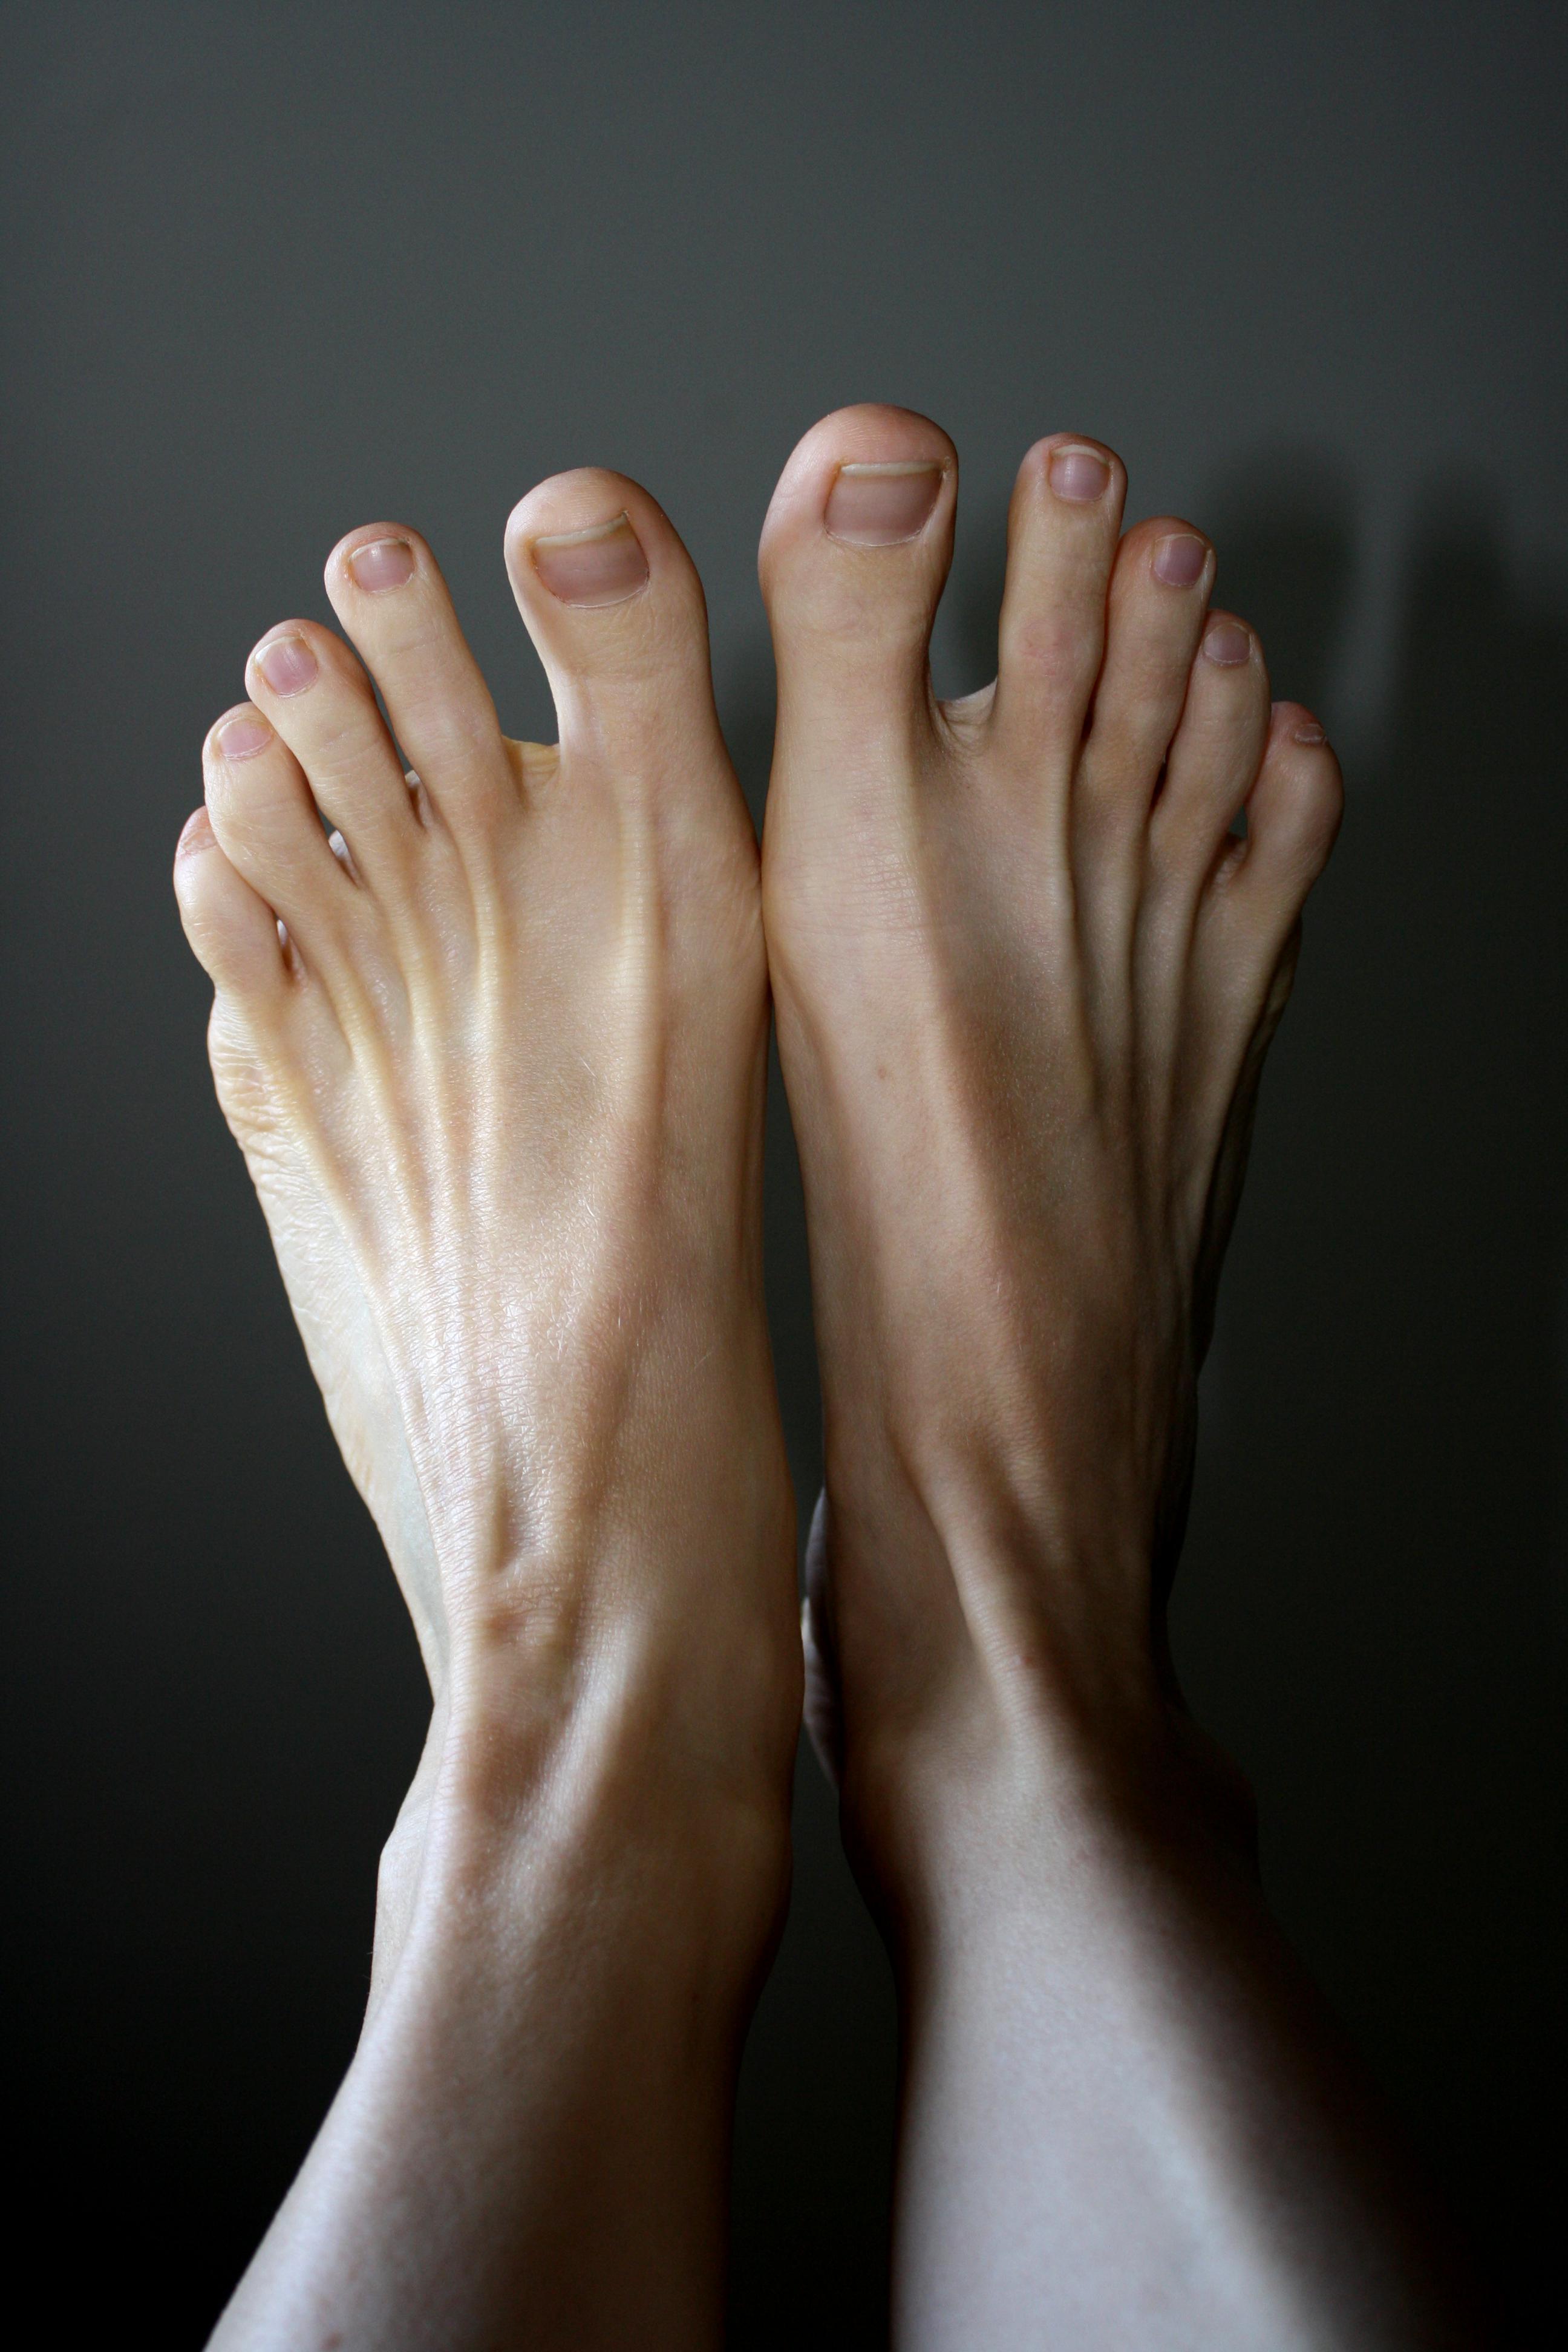 feet Pictures | Free Photographs | Photos Public Domain